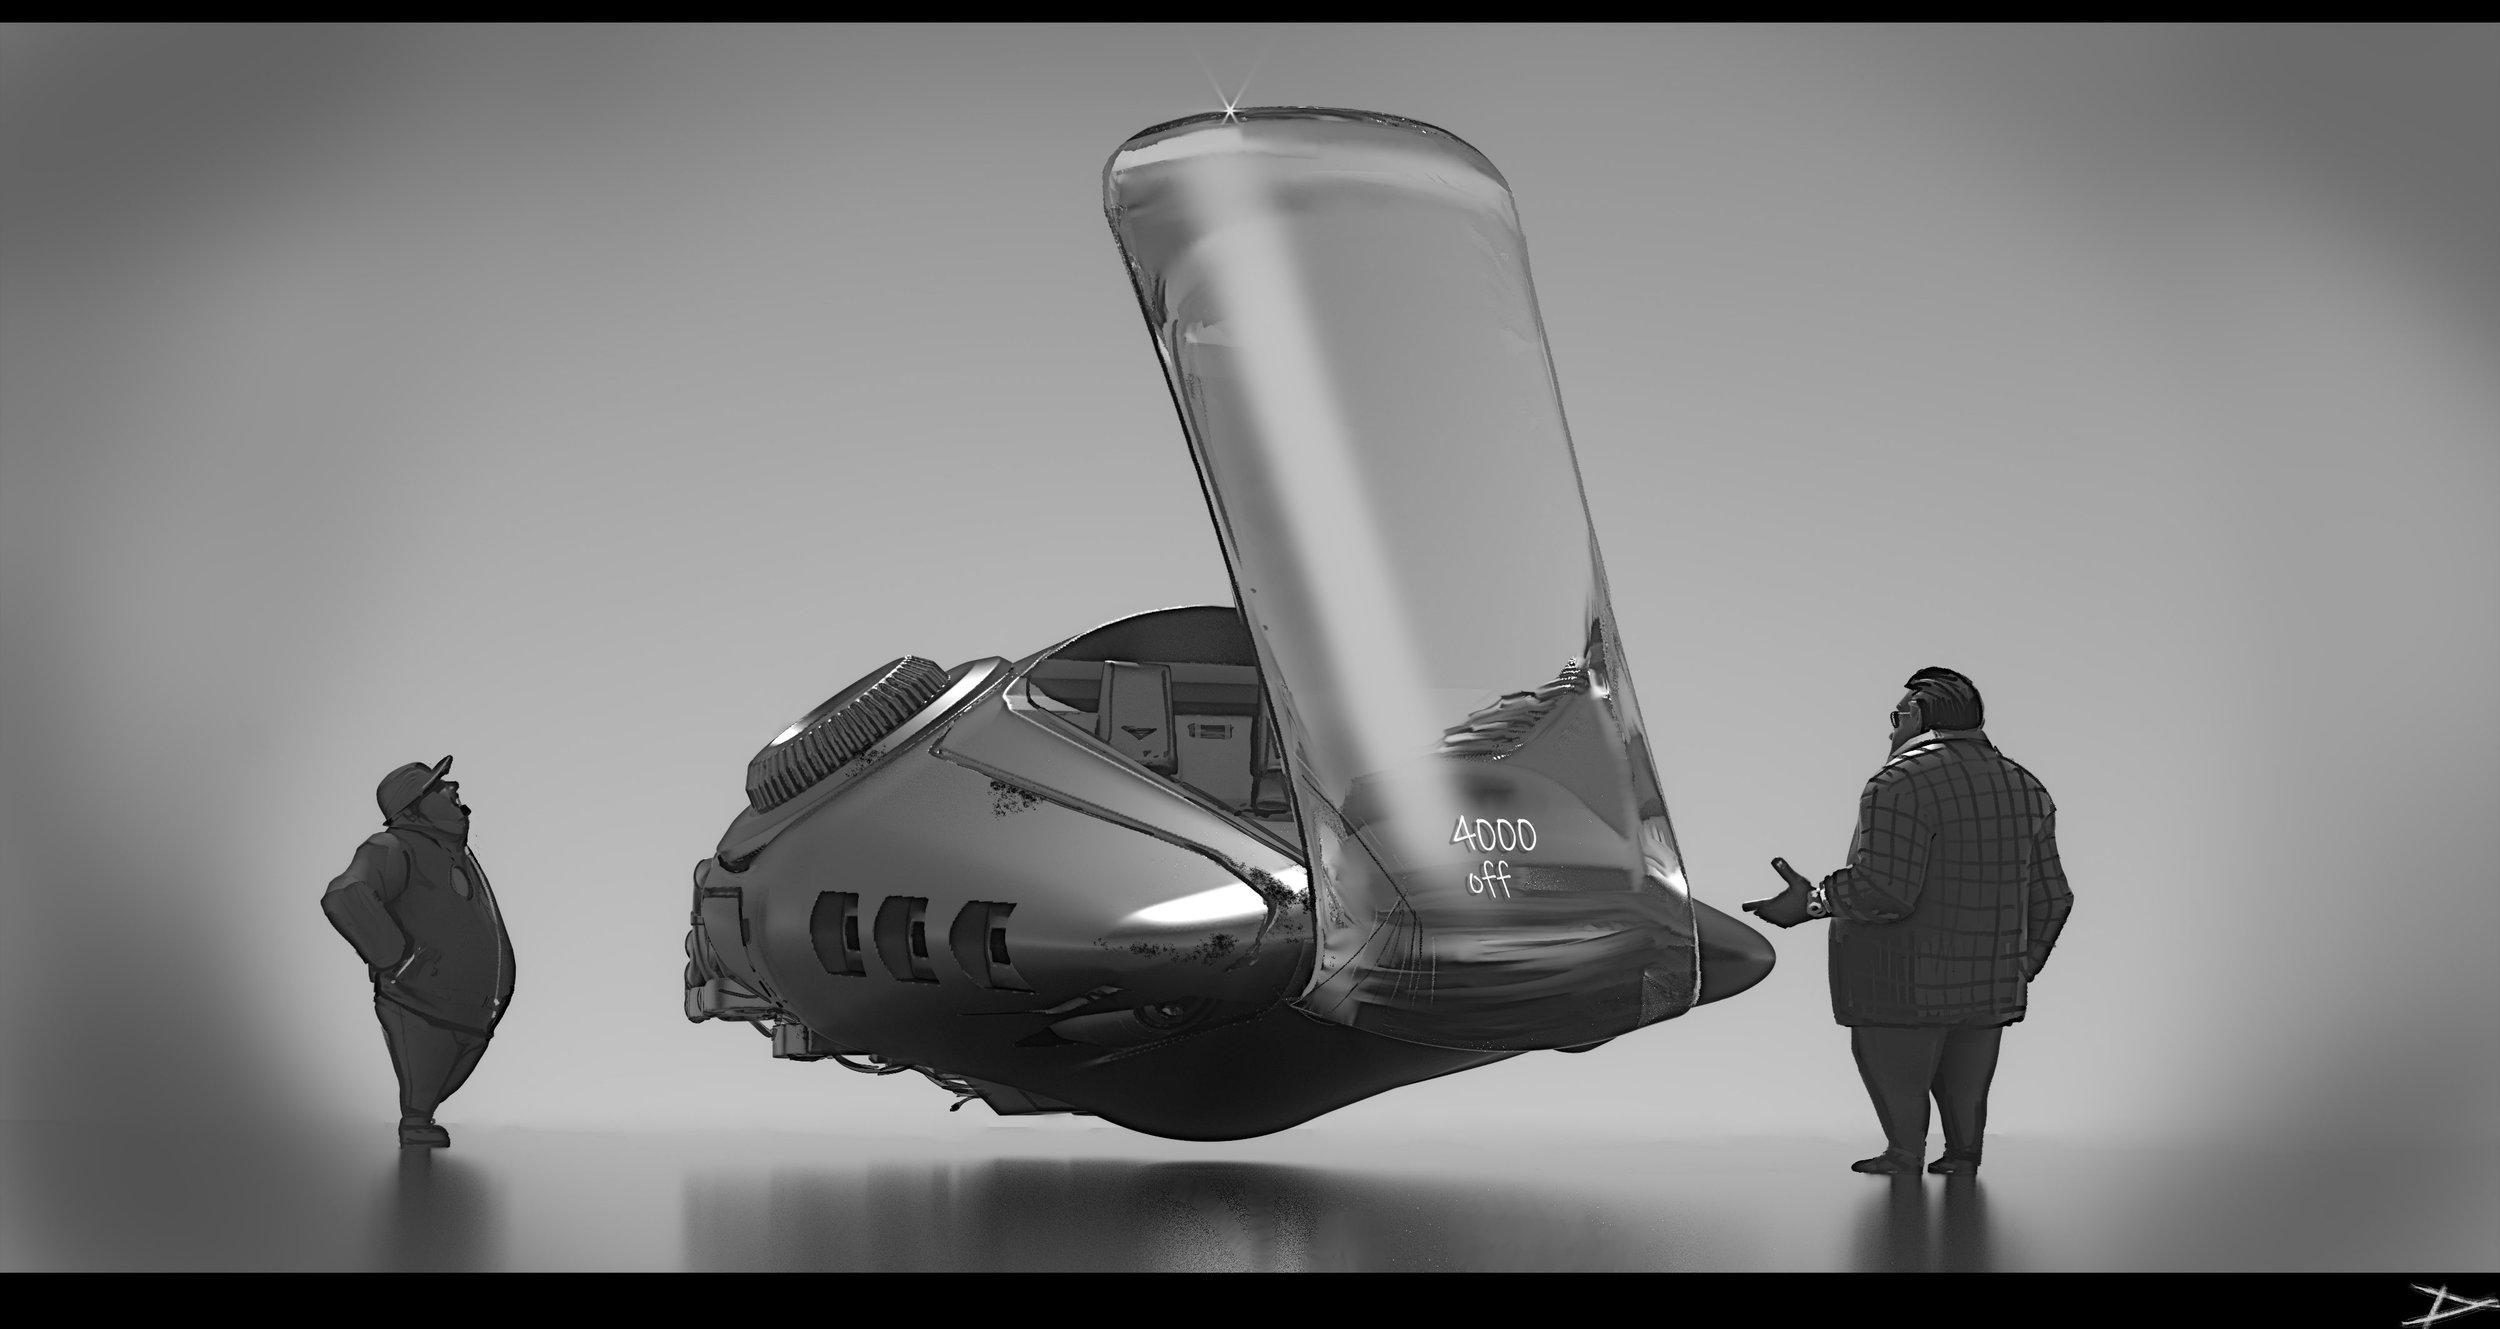 camaro3.jpg